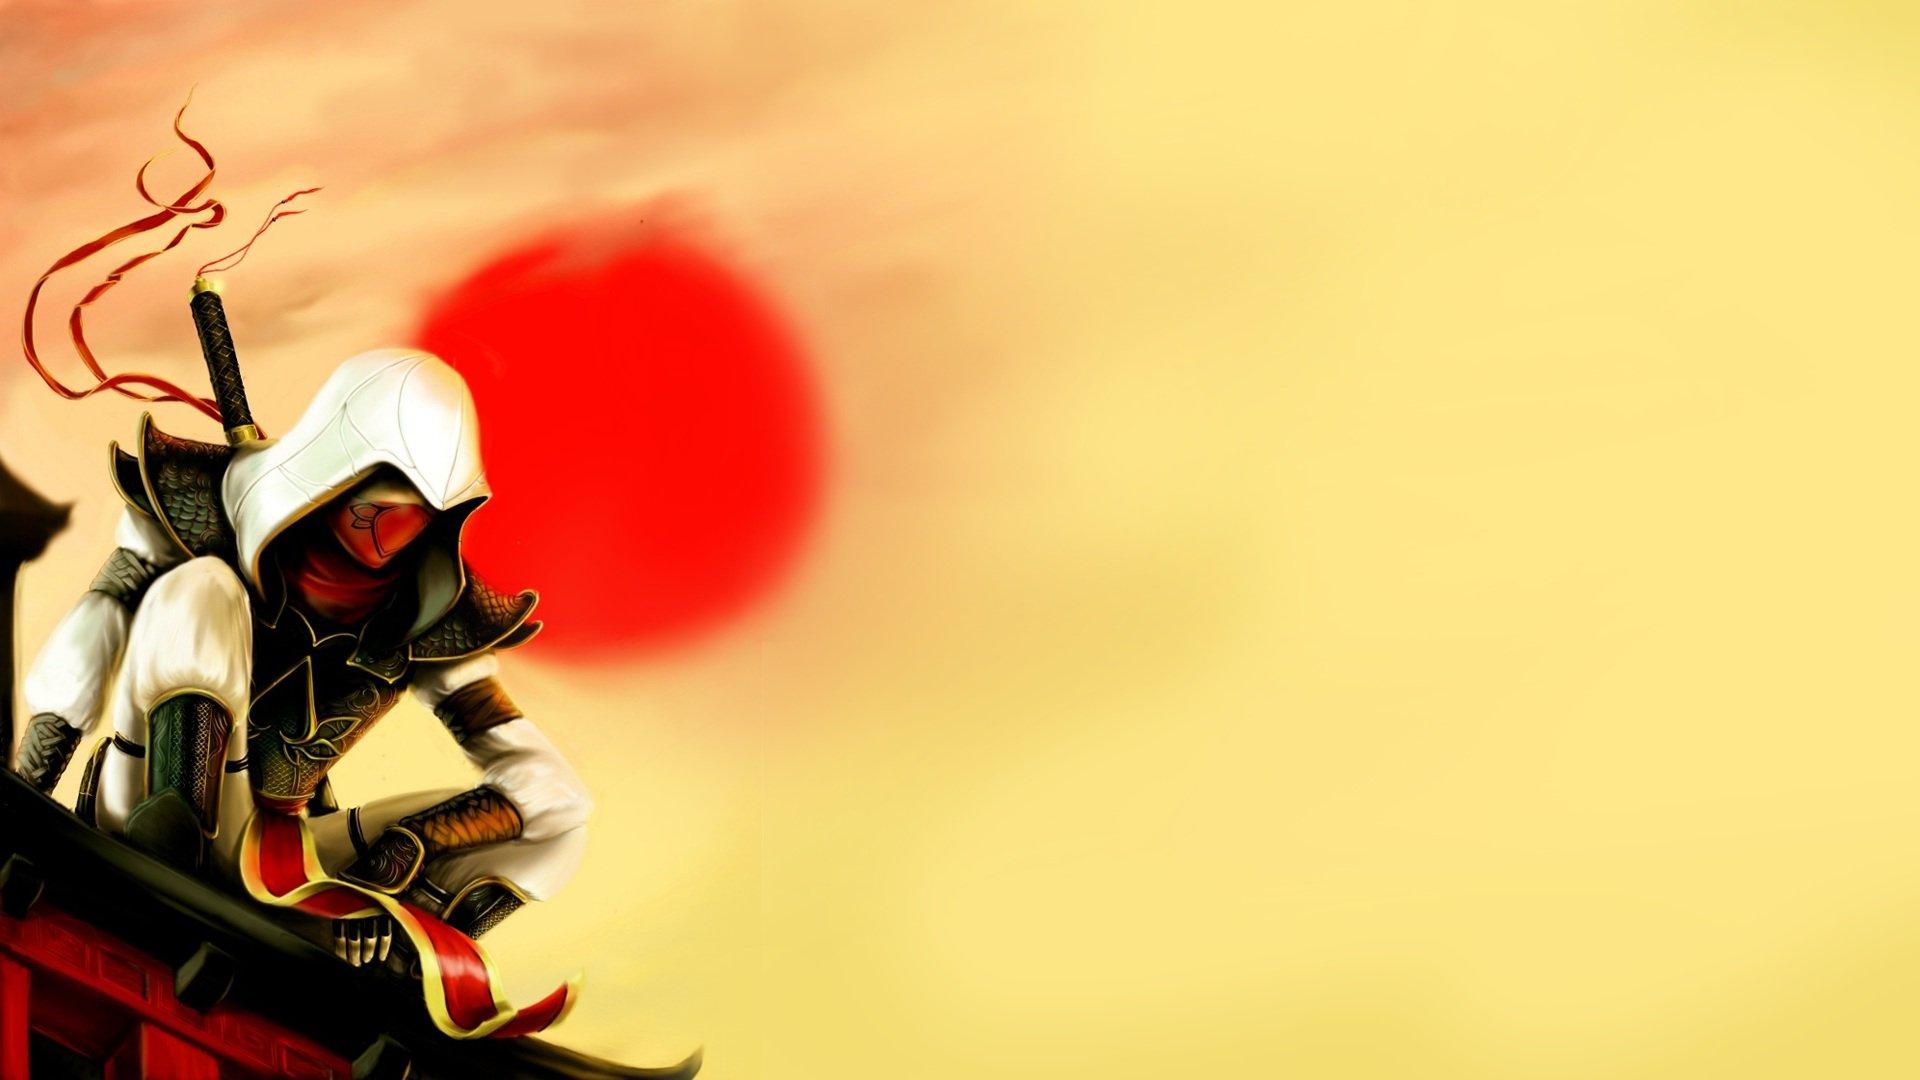 Assassins Creed Ninjas Japanese Wallpaper 1920x1080 312076